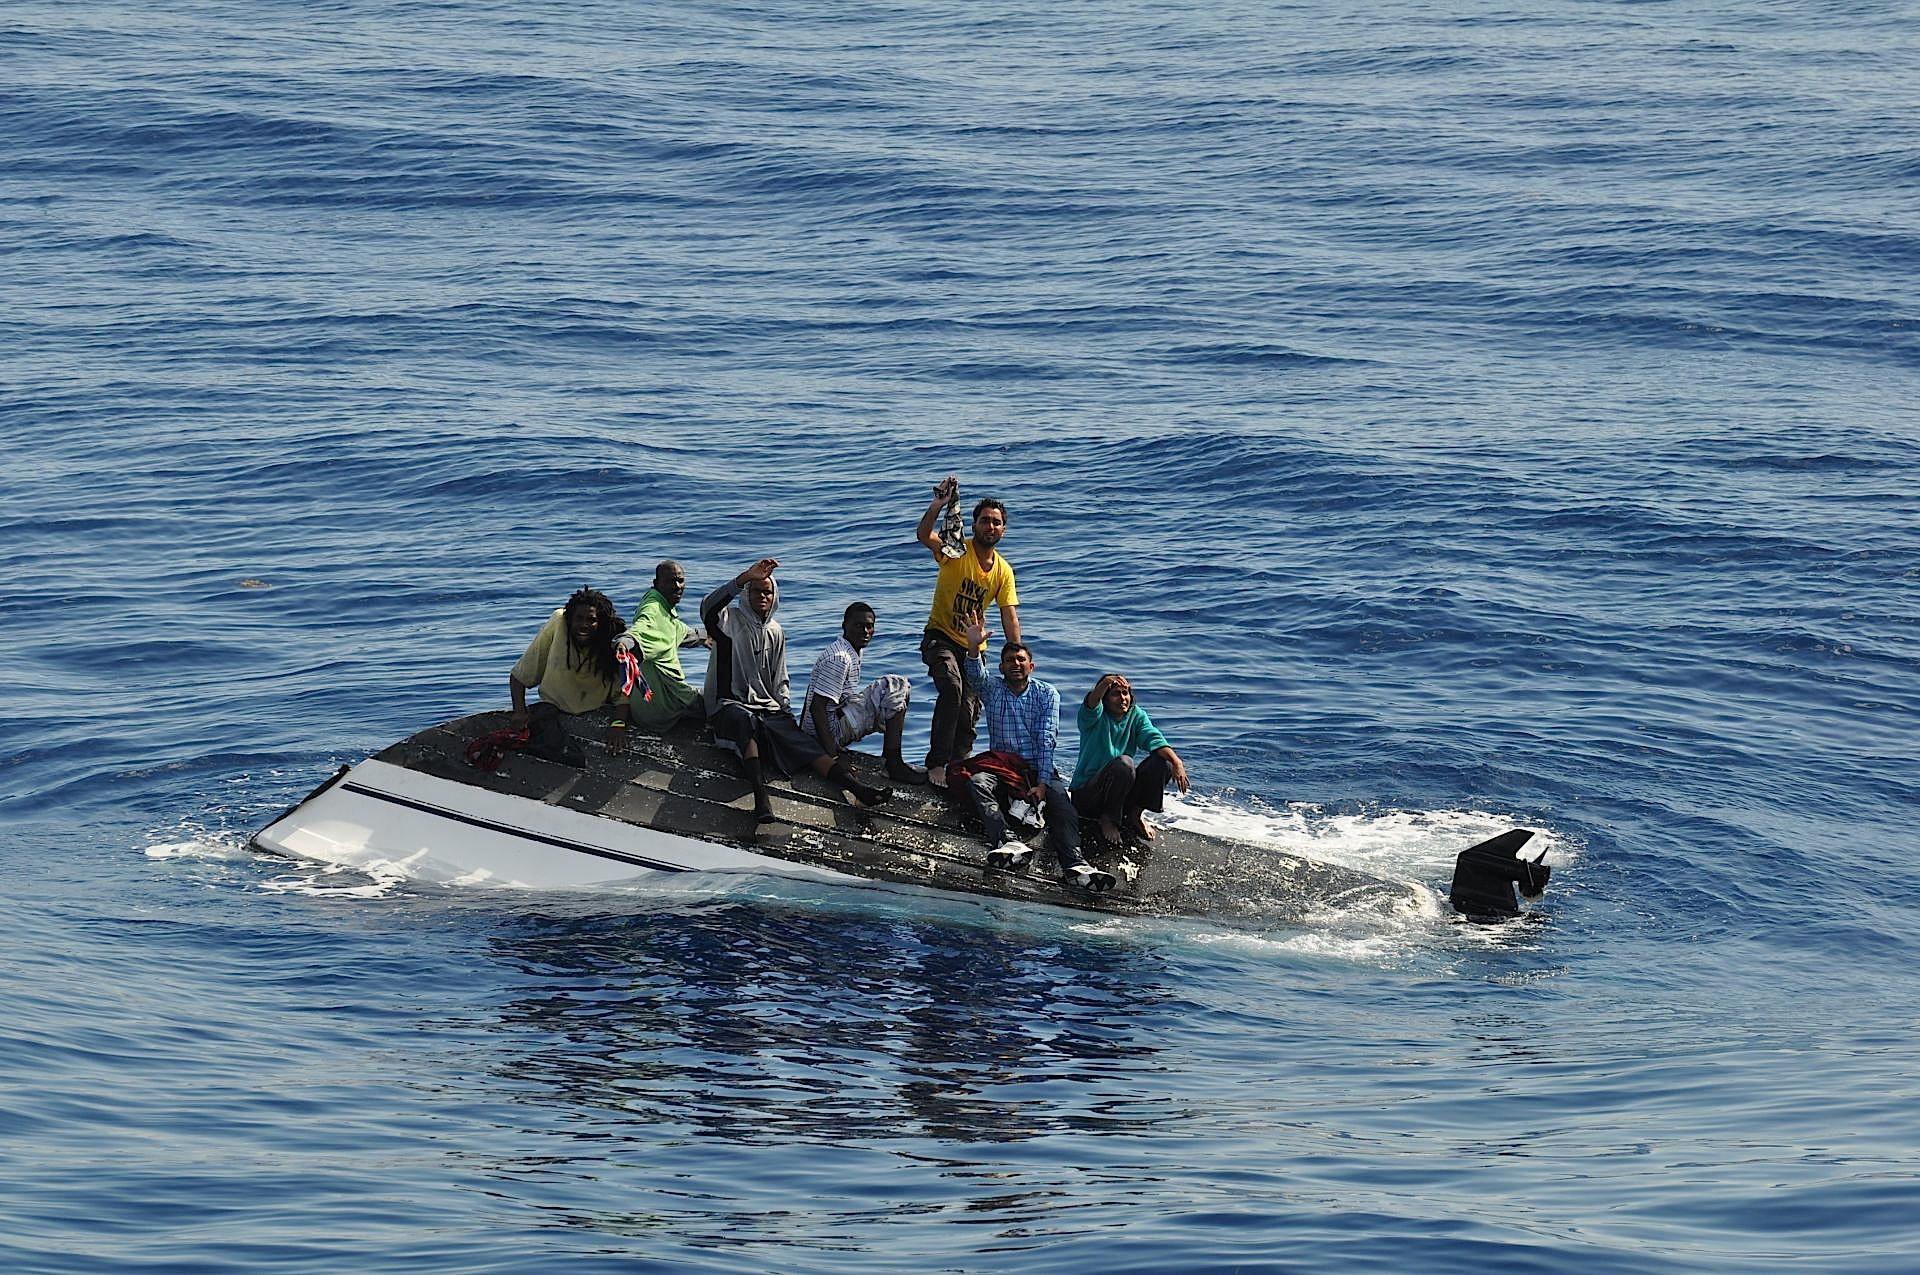 Sinking boat photo